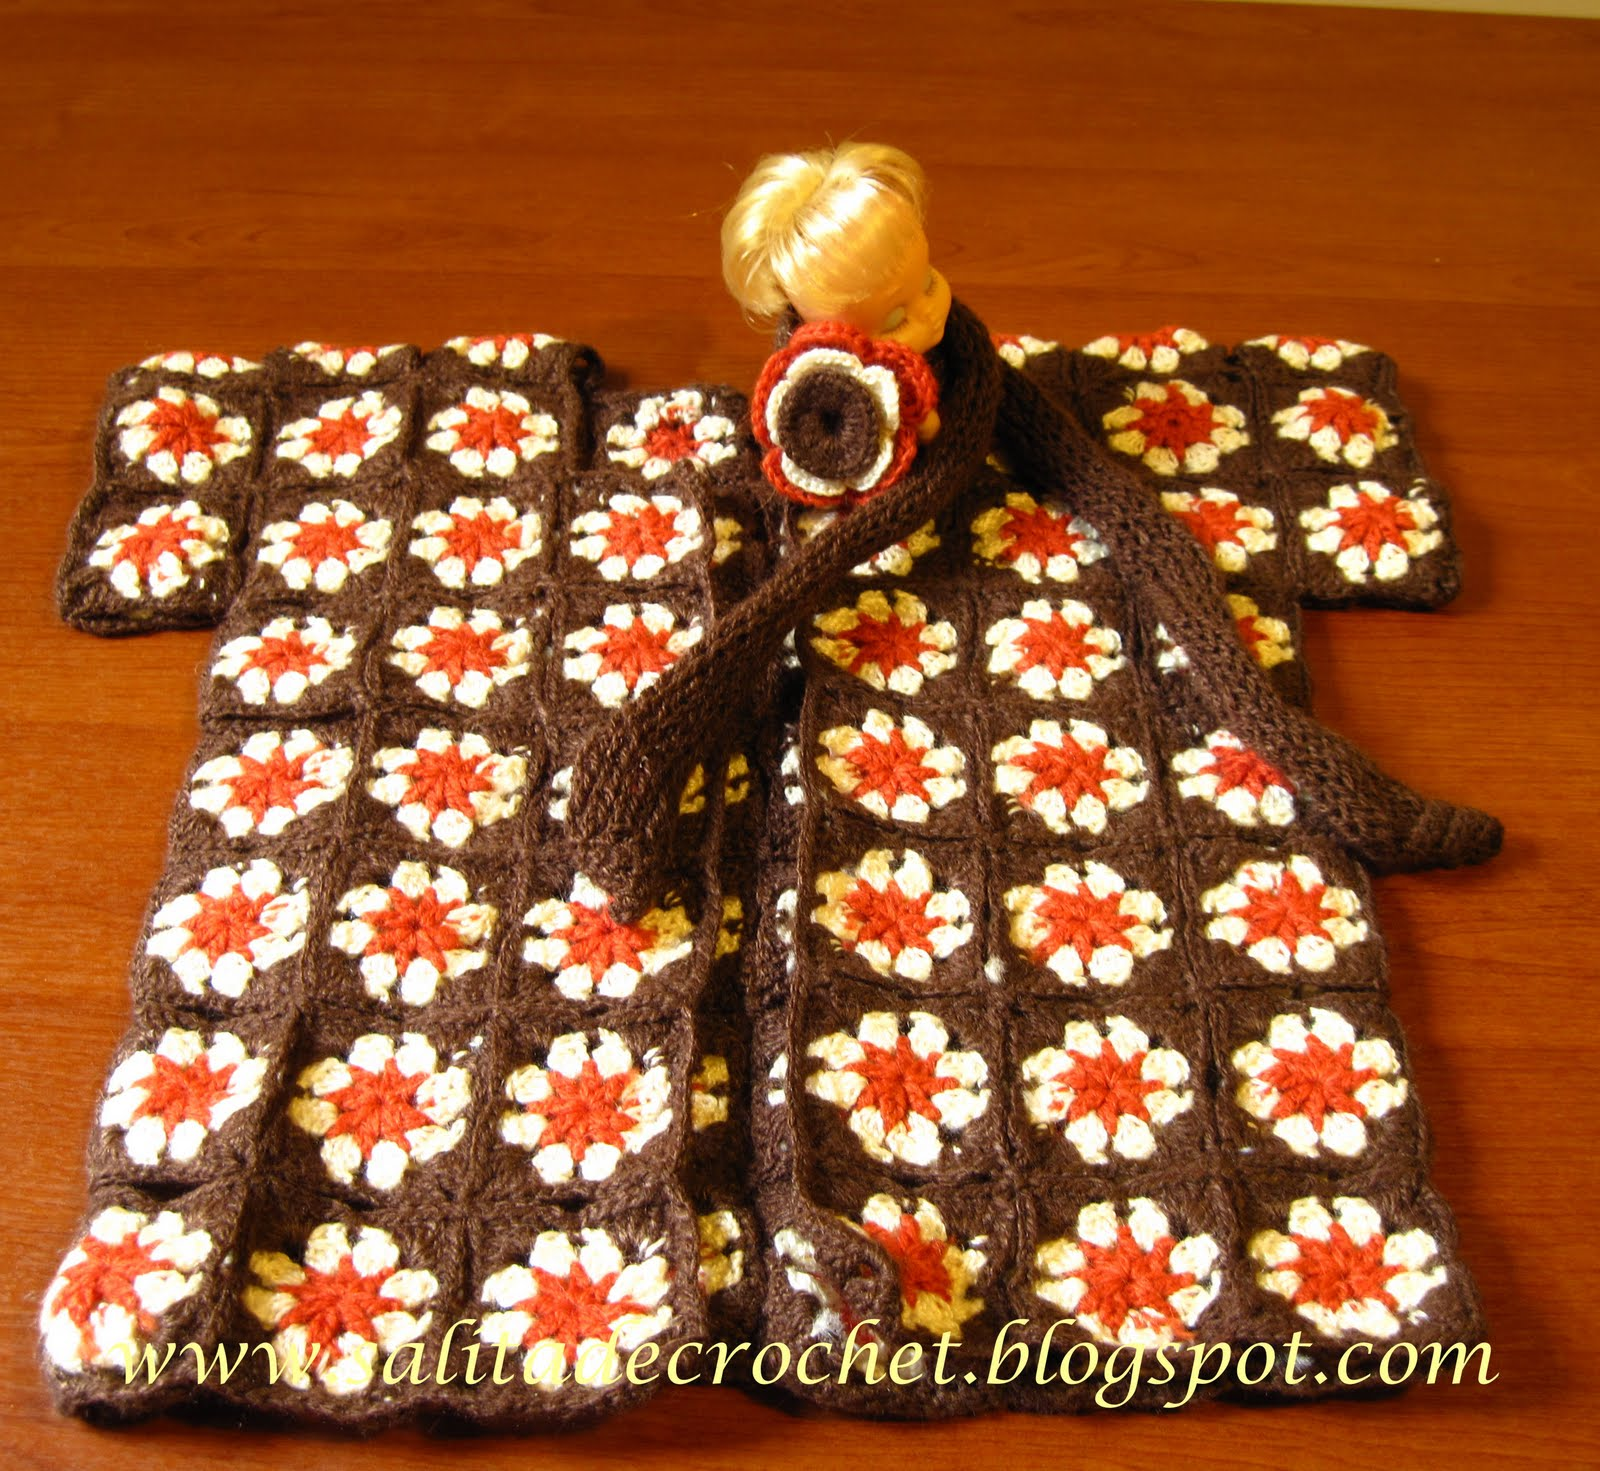 Salita de Crochet